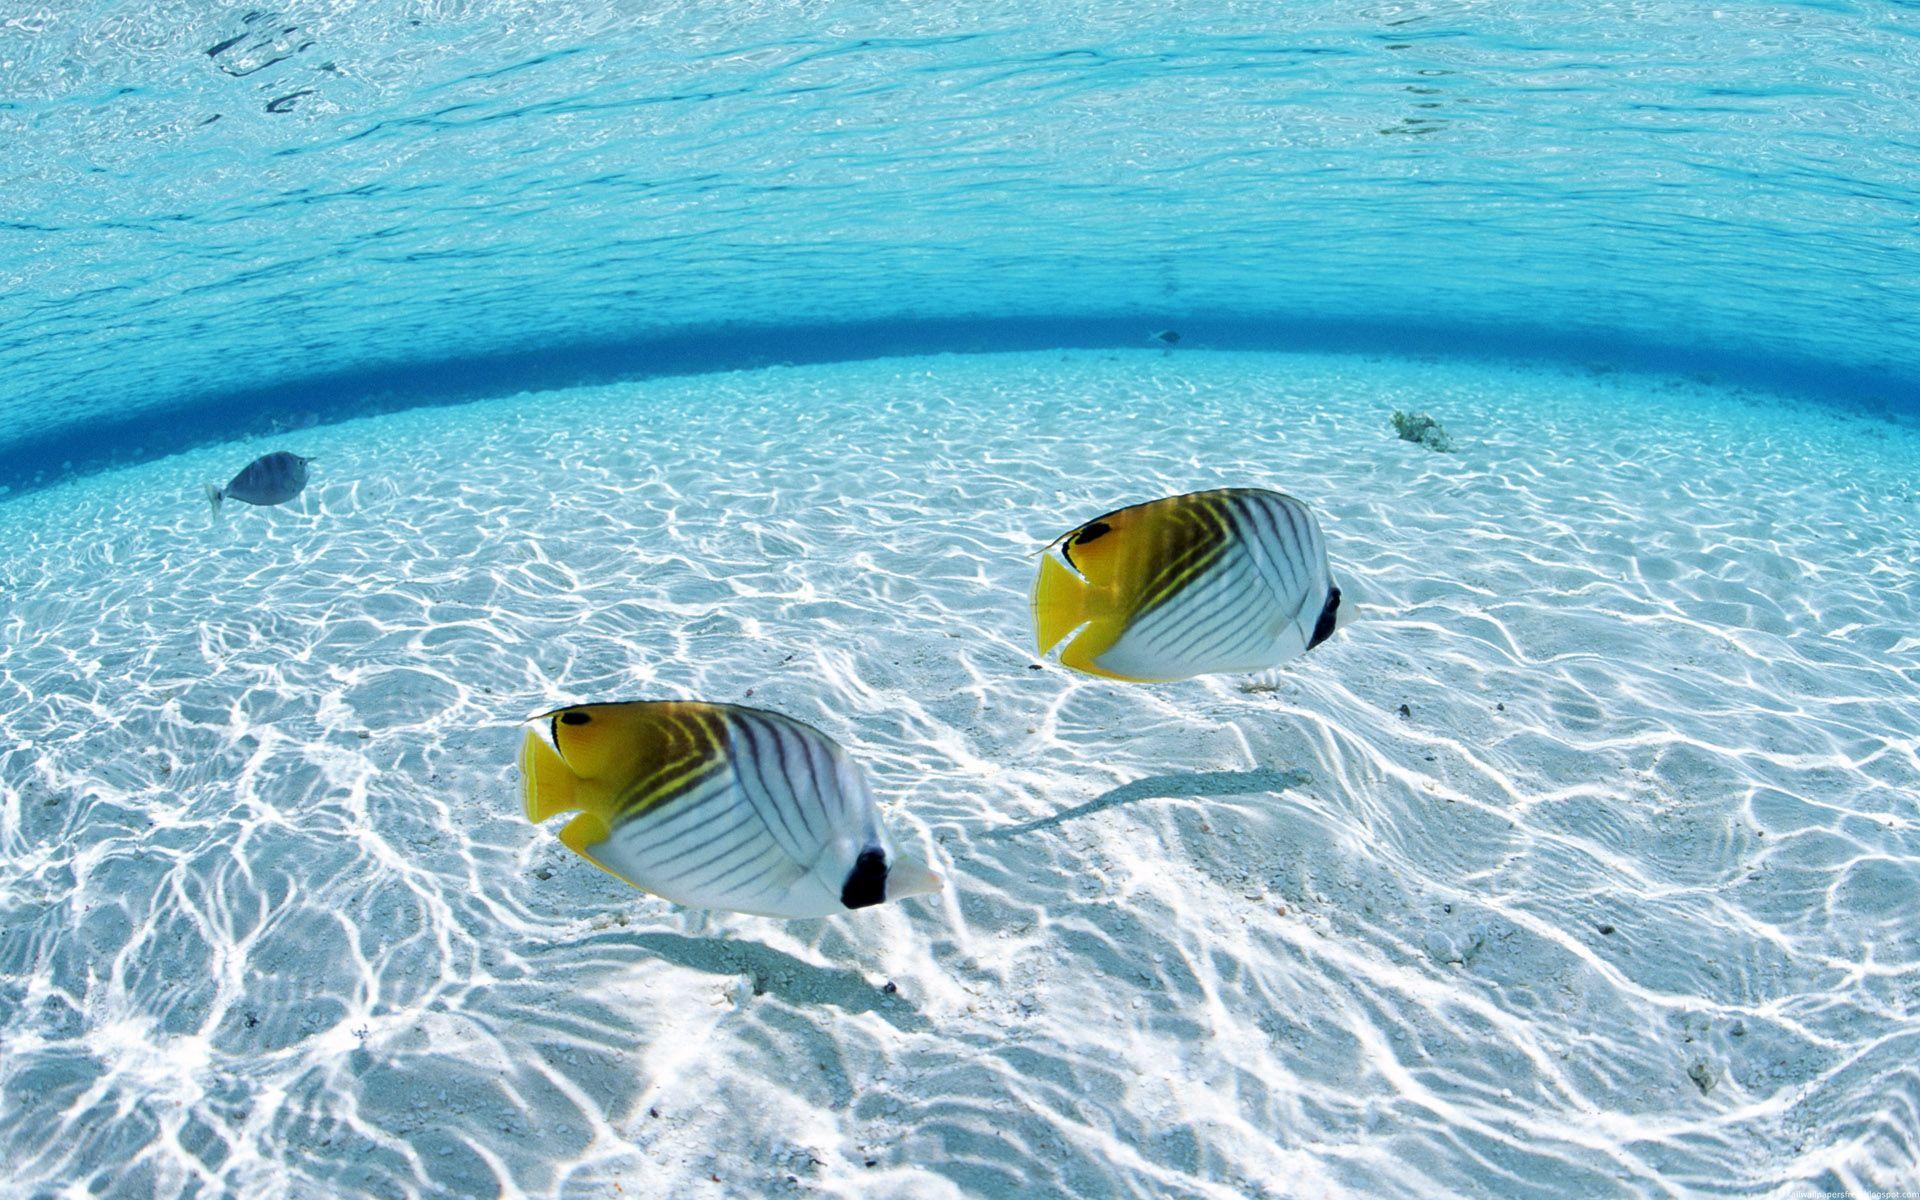 Underwater On The Sea - Underwater On The Sea